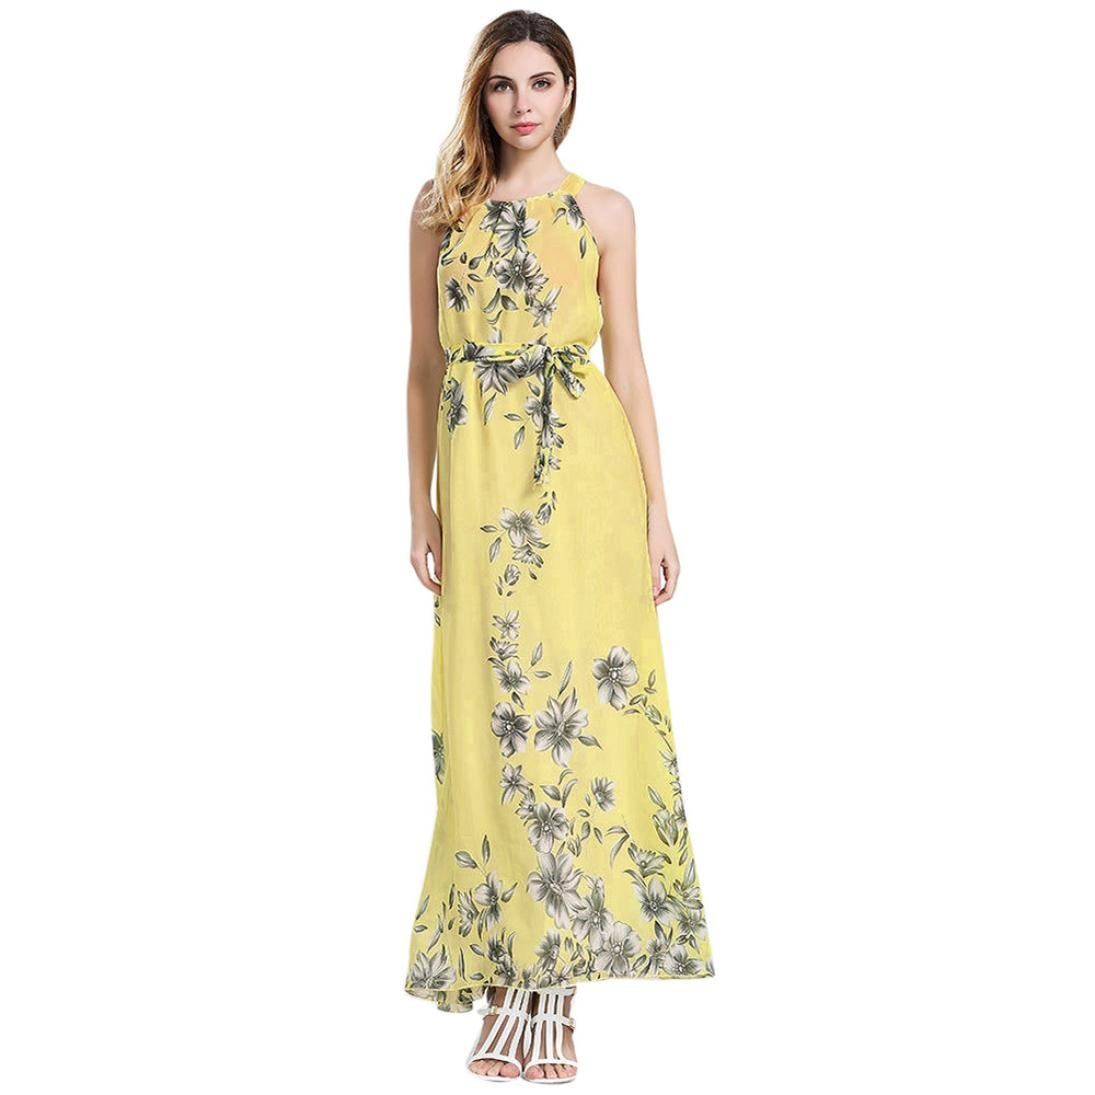 4d1ba19dc3d Floral Print Maxi Dress For Wedding – DACC